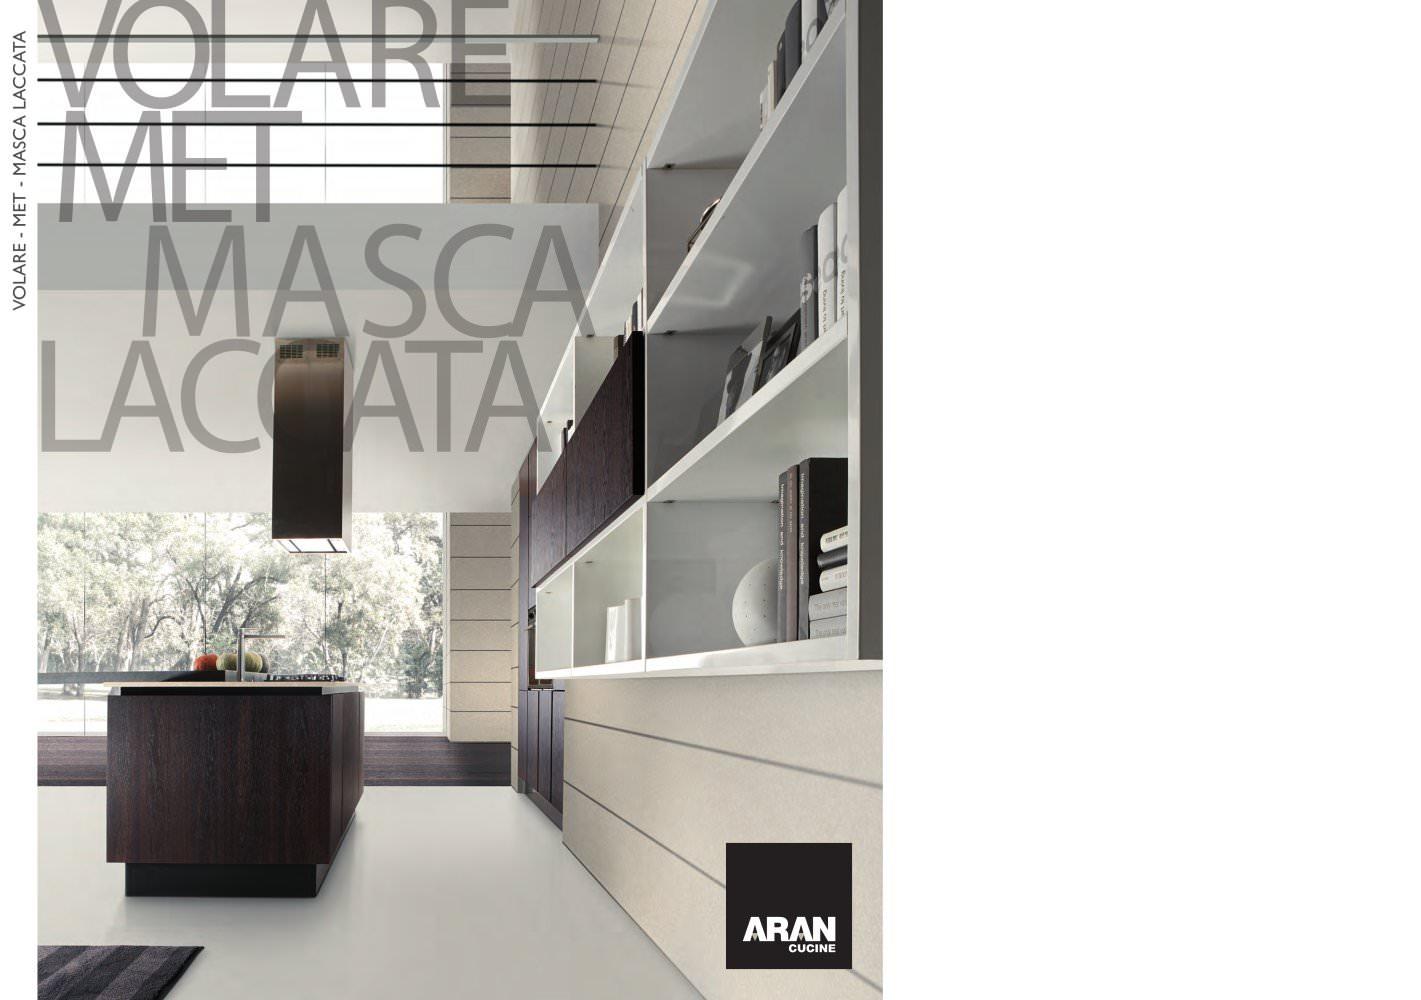 Volare - ARAN Cucine - PDF Catalogues | Documentation | Brochures